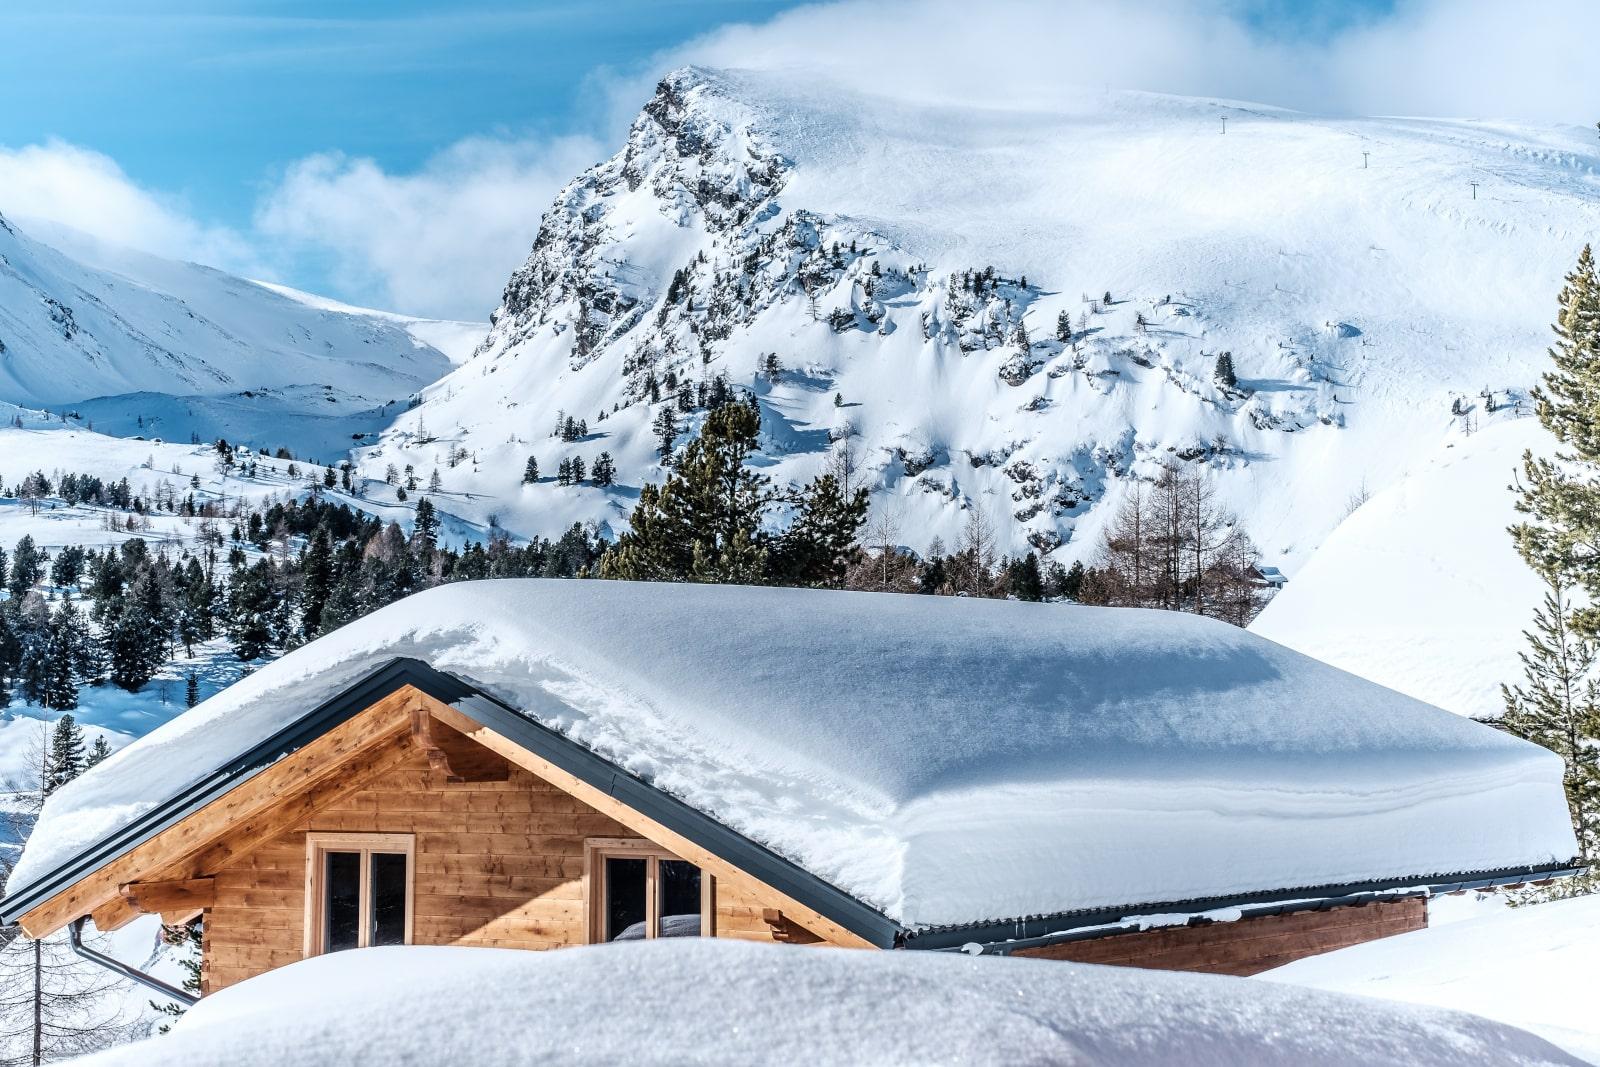 Heidi-Chalet-Falkert-Heidialm-Bergwinter-Winter-Schnee-Huette-Ski-Schnee